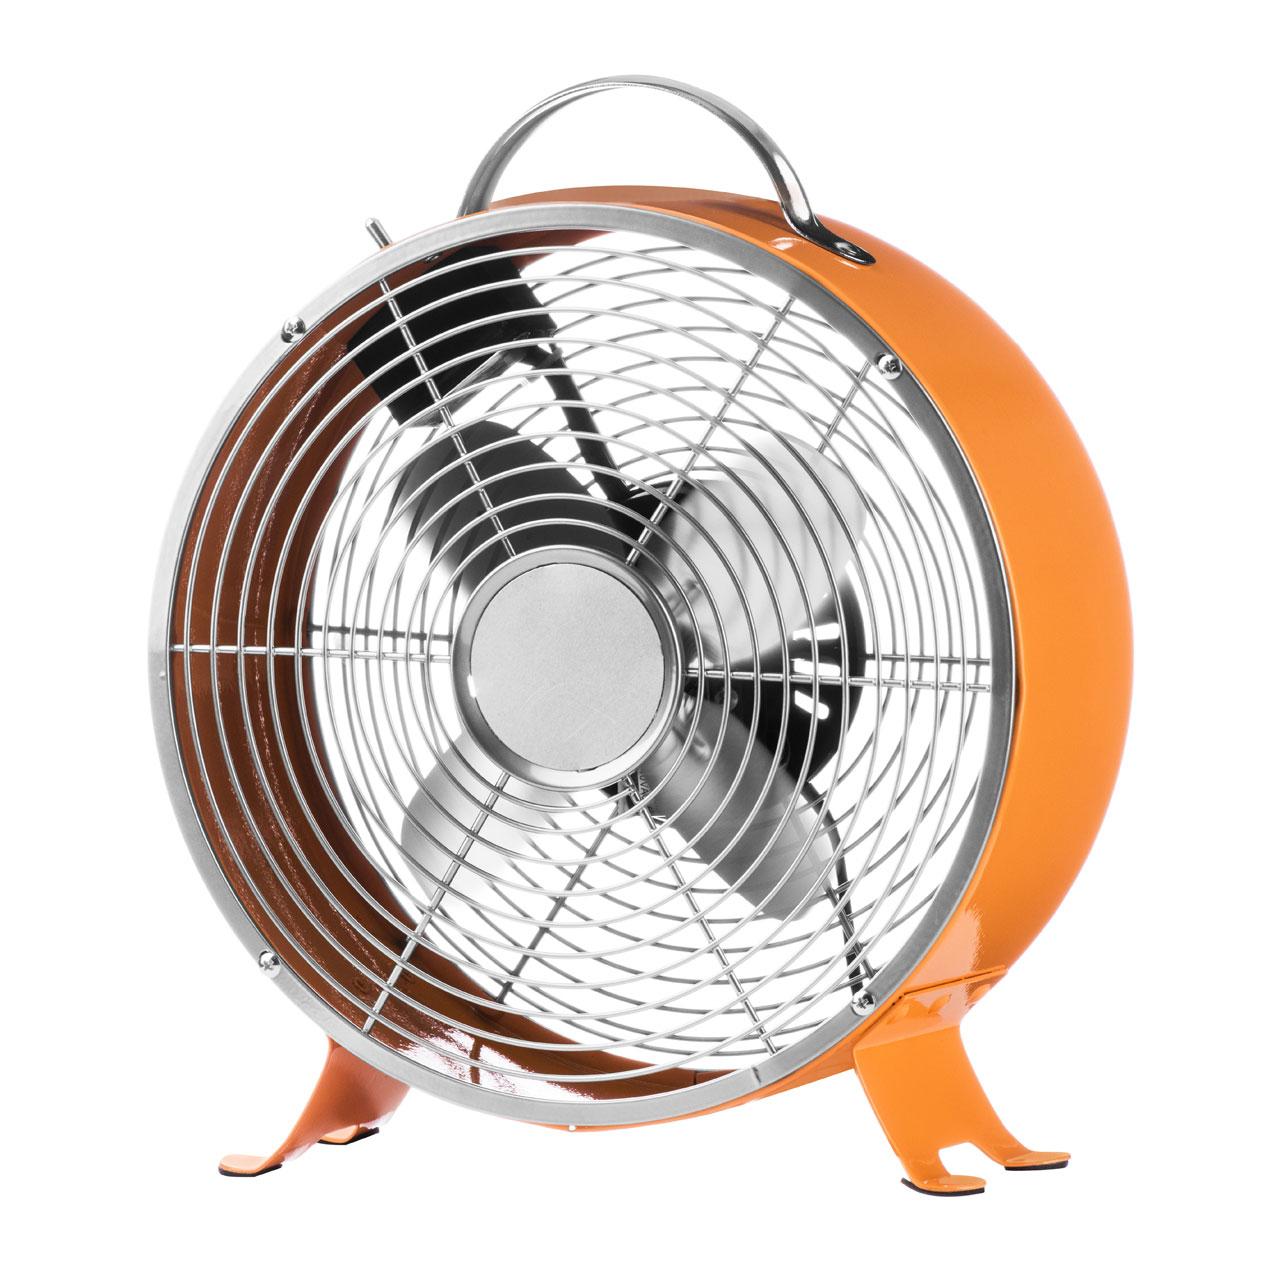 Kipas angin meja f 15da maspion. Source · Orange Retro Design Desk Fan 2 Sds Non Slip Feet Handle On